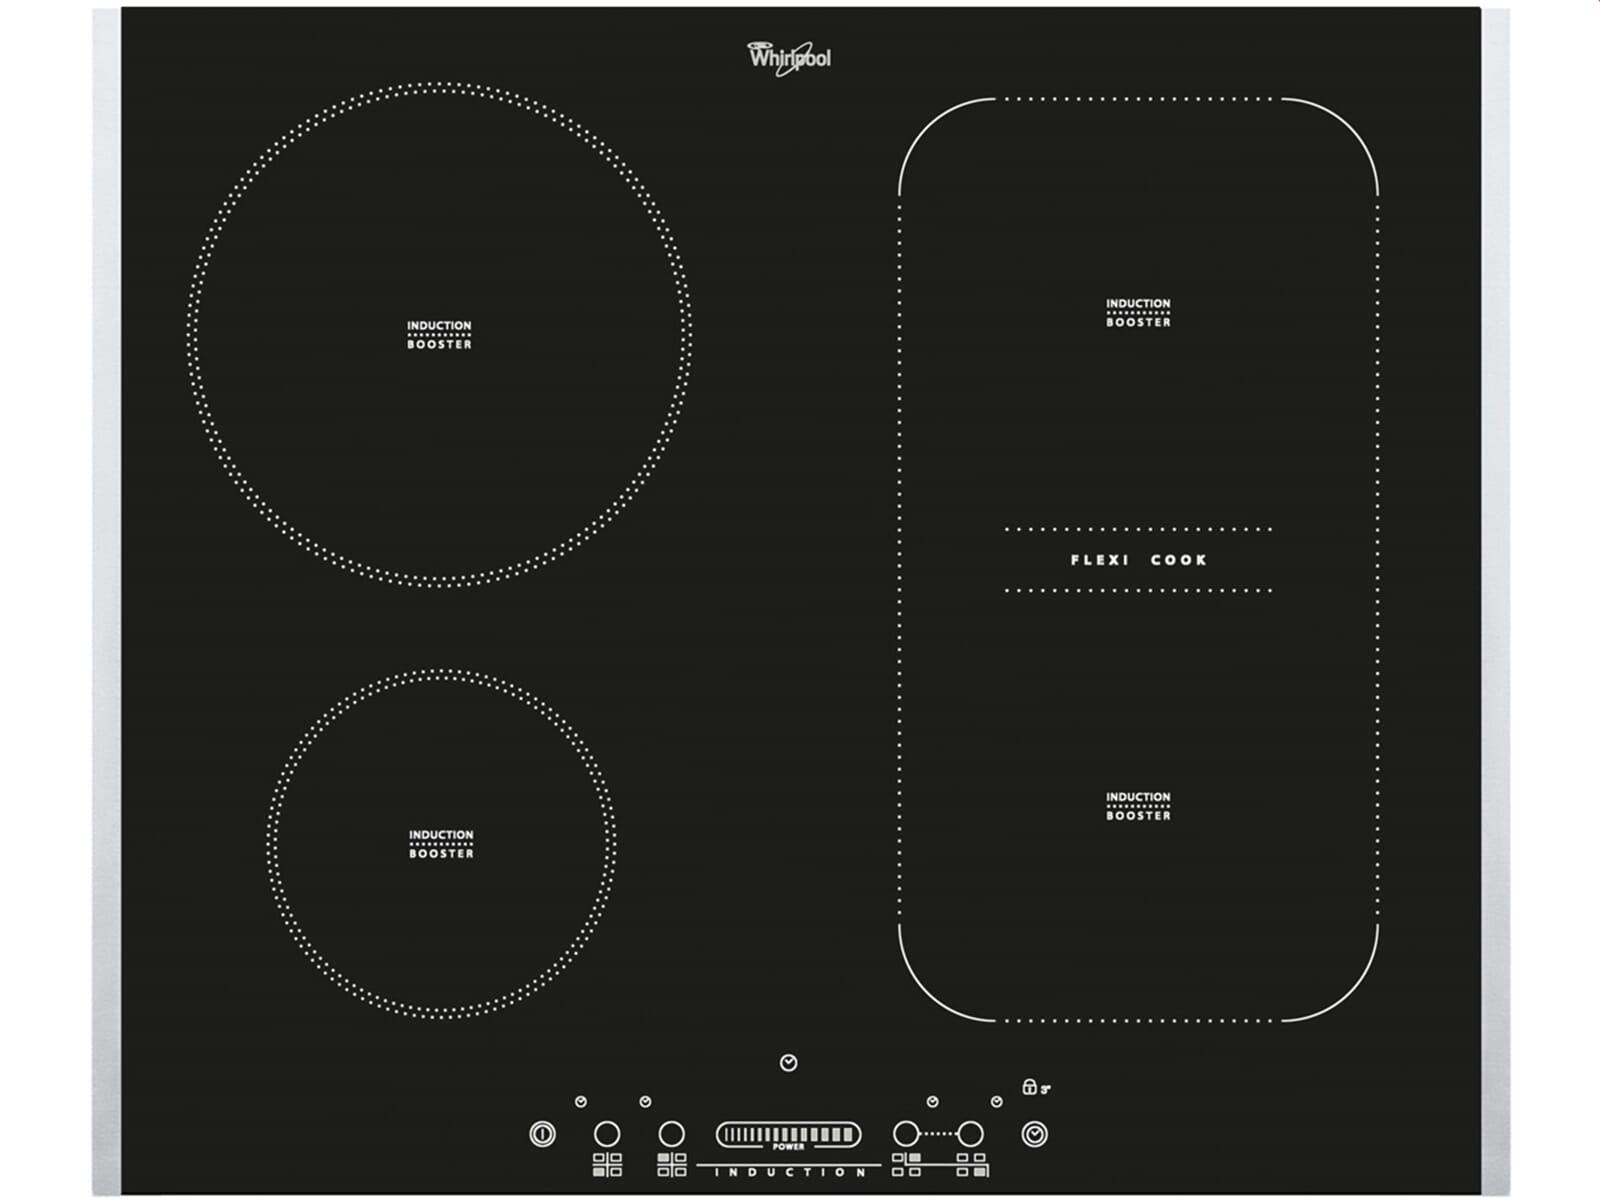 whirlpool acm 810 lx induktion glaskeramik kochfeld f r. Black Bedroom Furniture Sets. Home Design Ideas